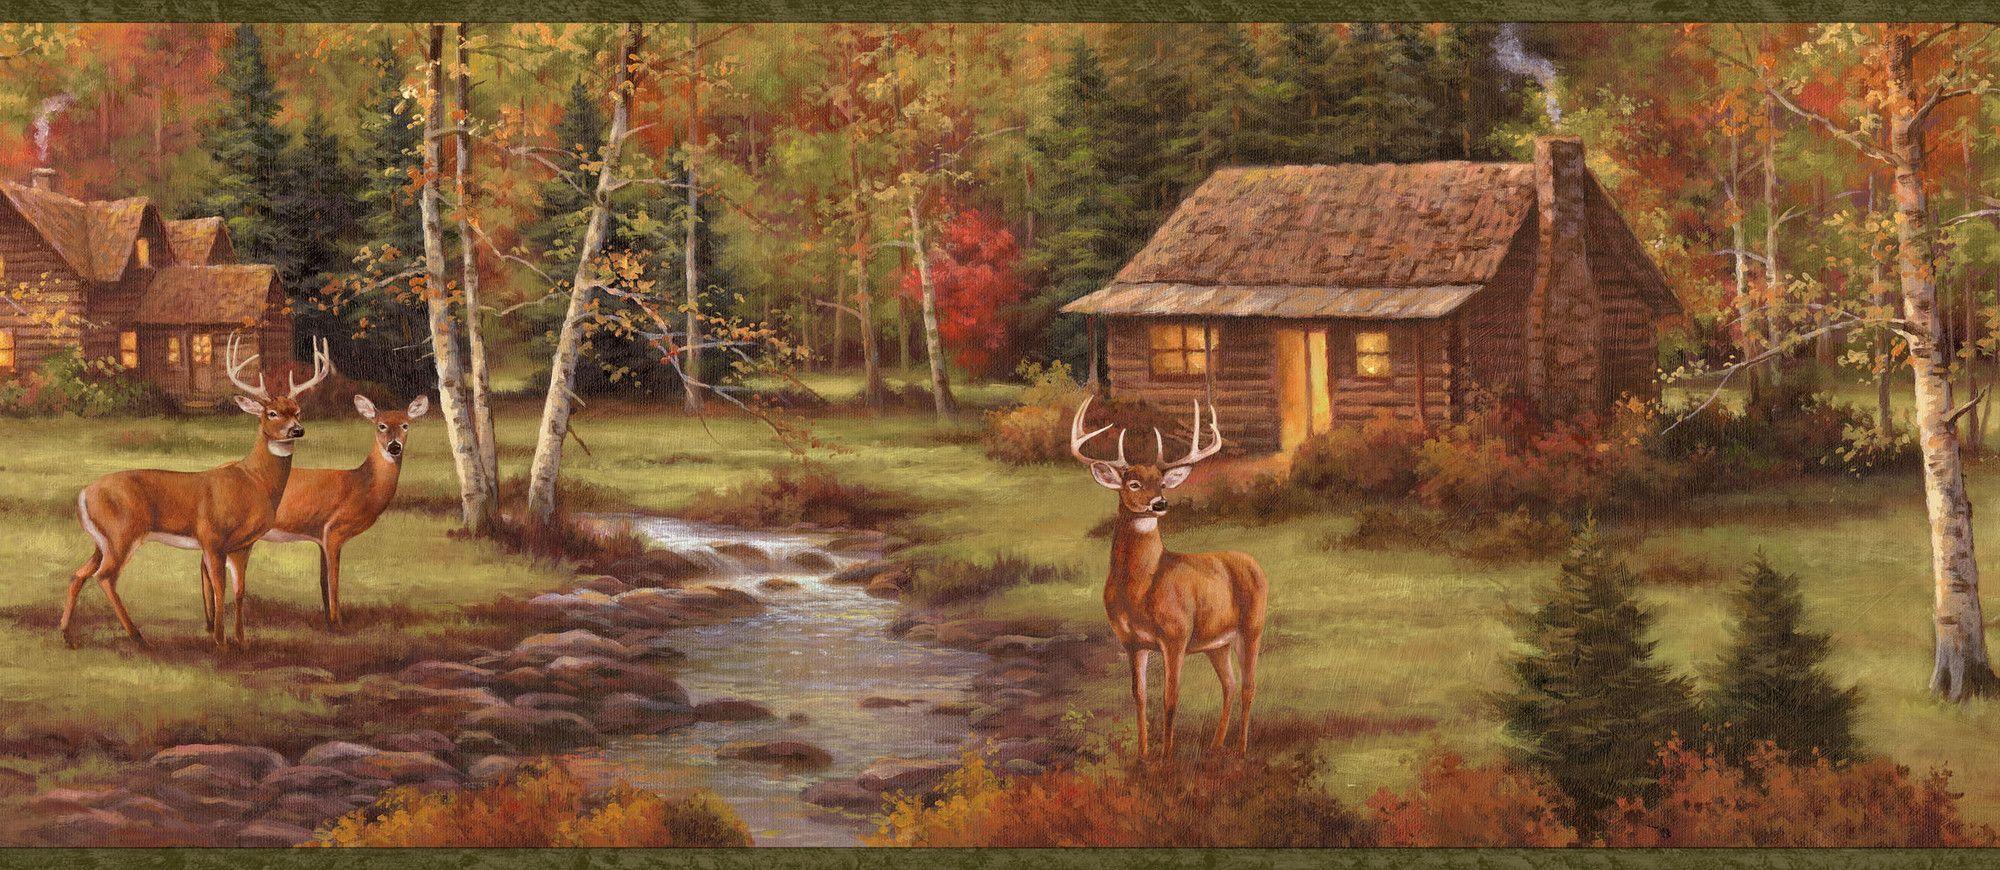 Borders by Chesapeake Lodge Stag Creek Portrait 15' x 8.25